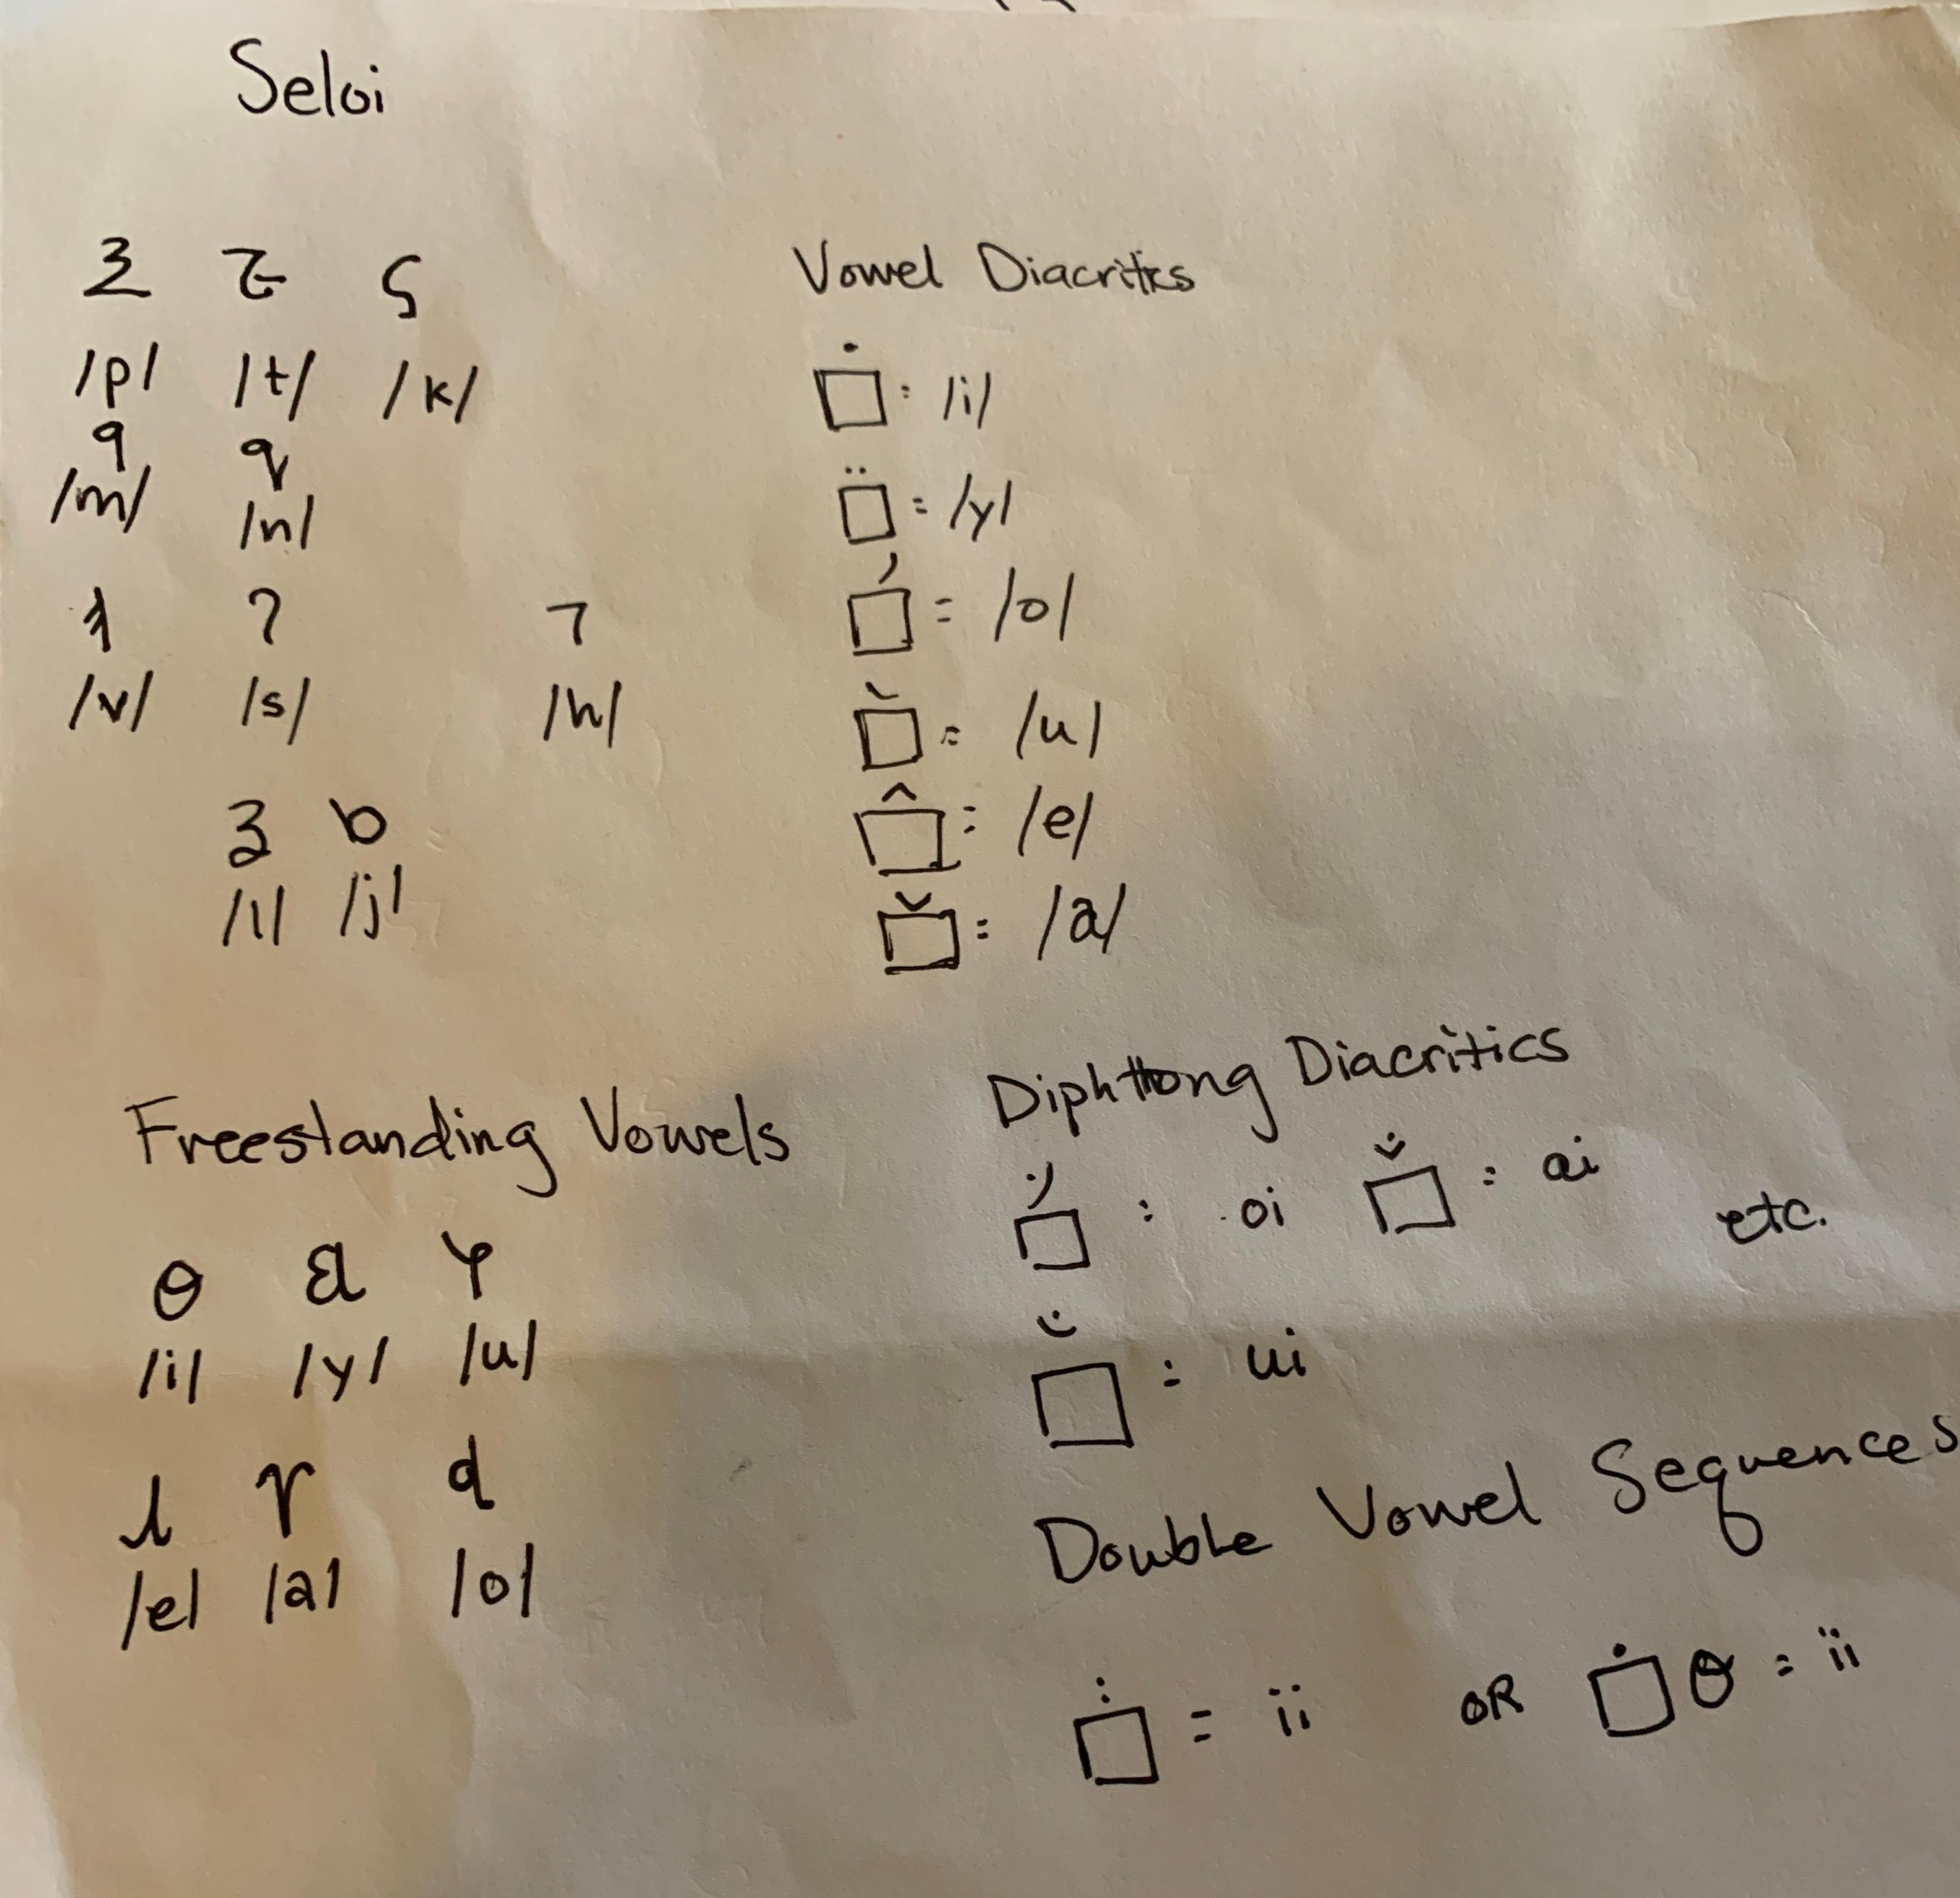 Seloi alphabet: Vinuvu